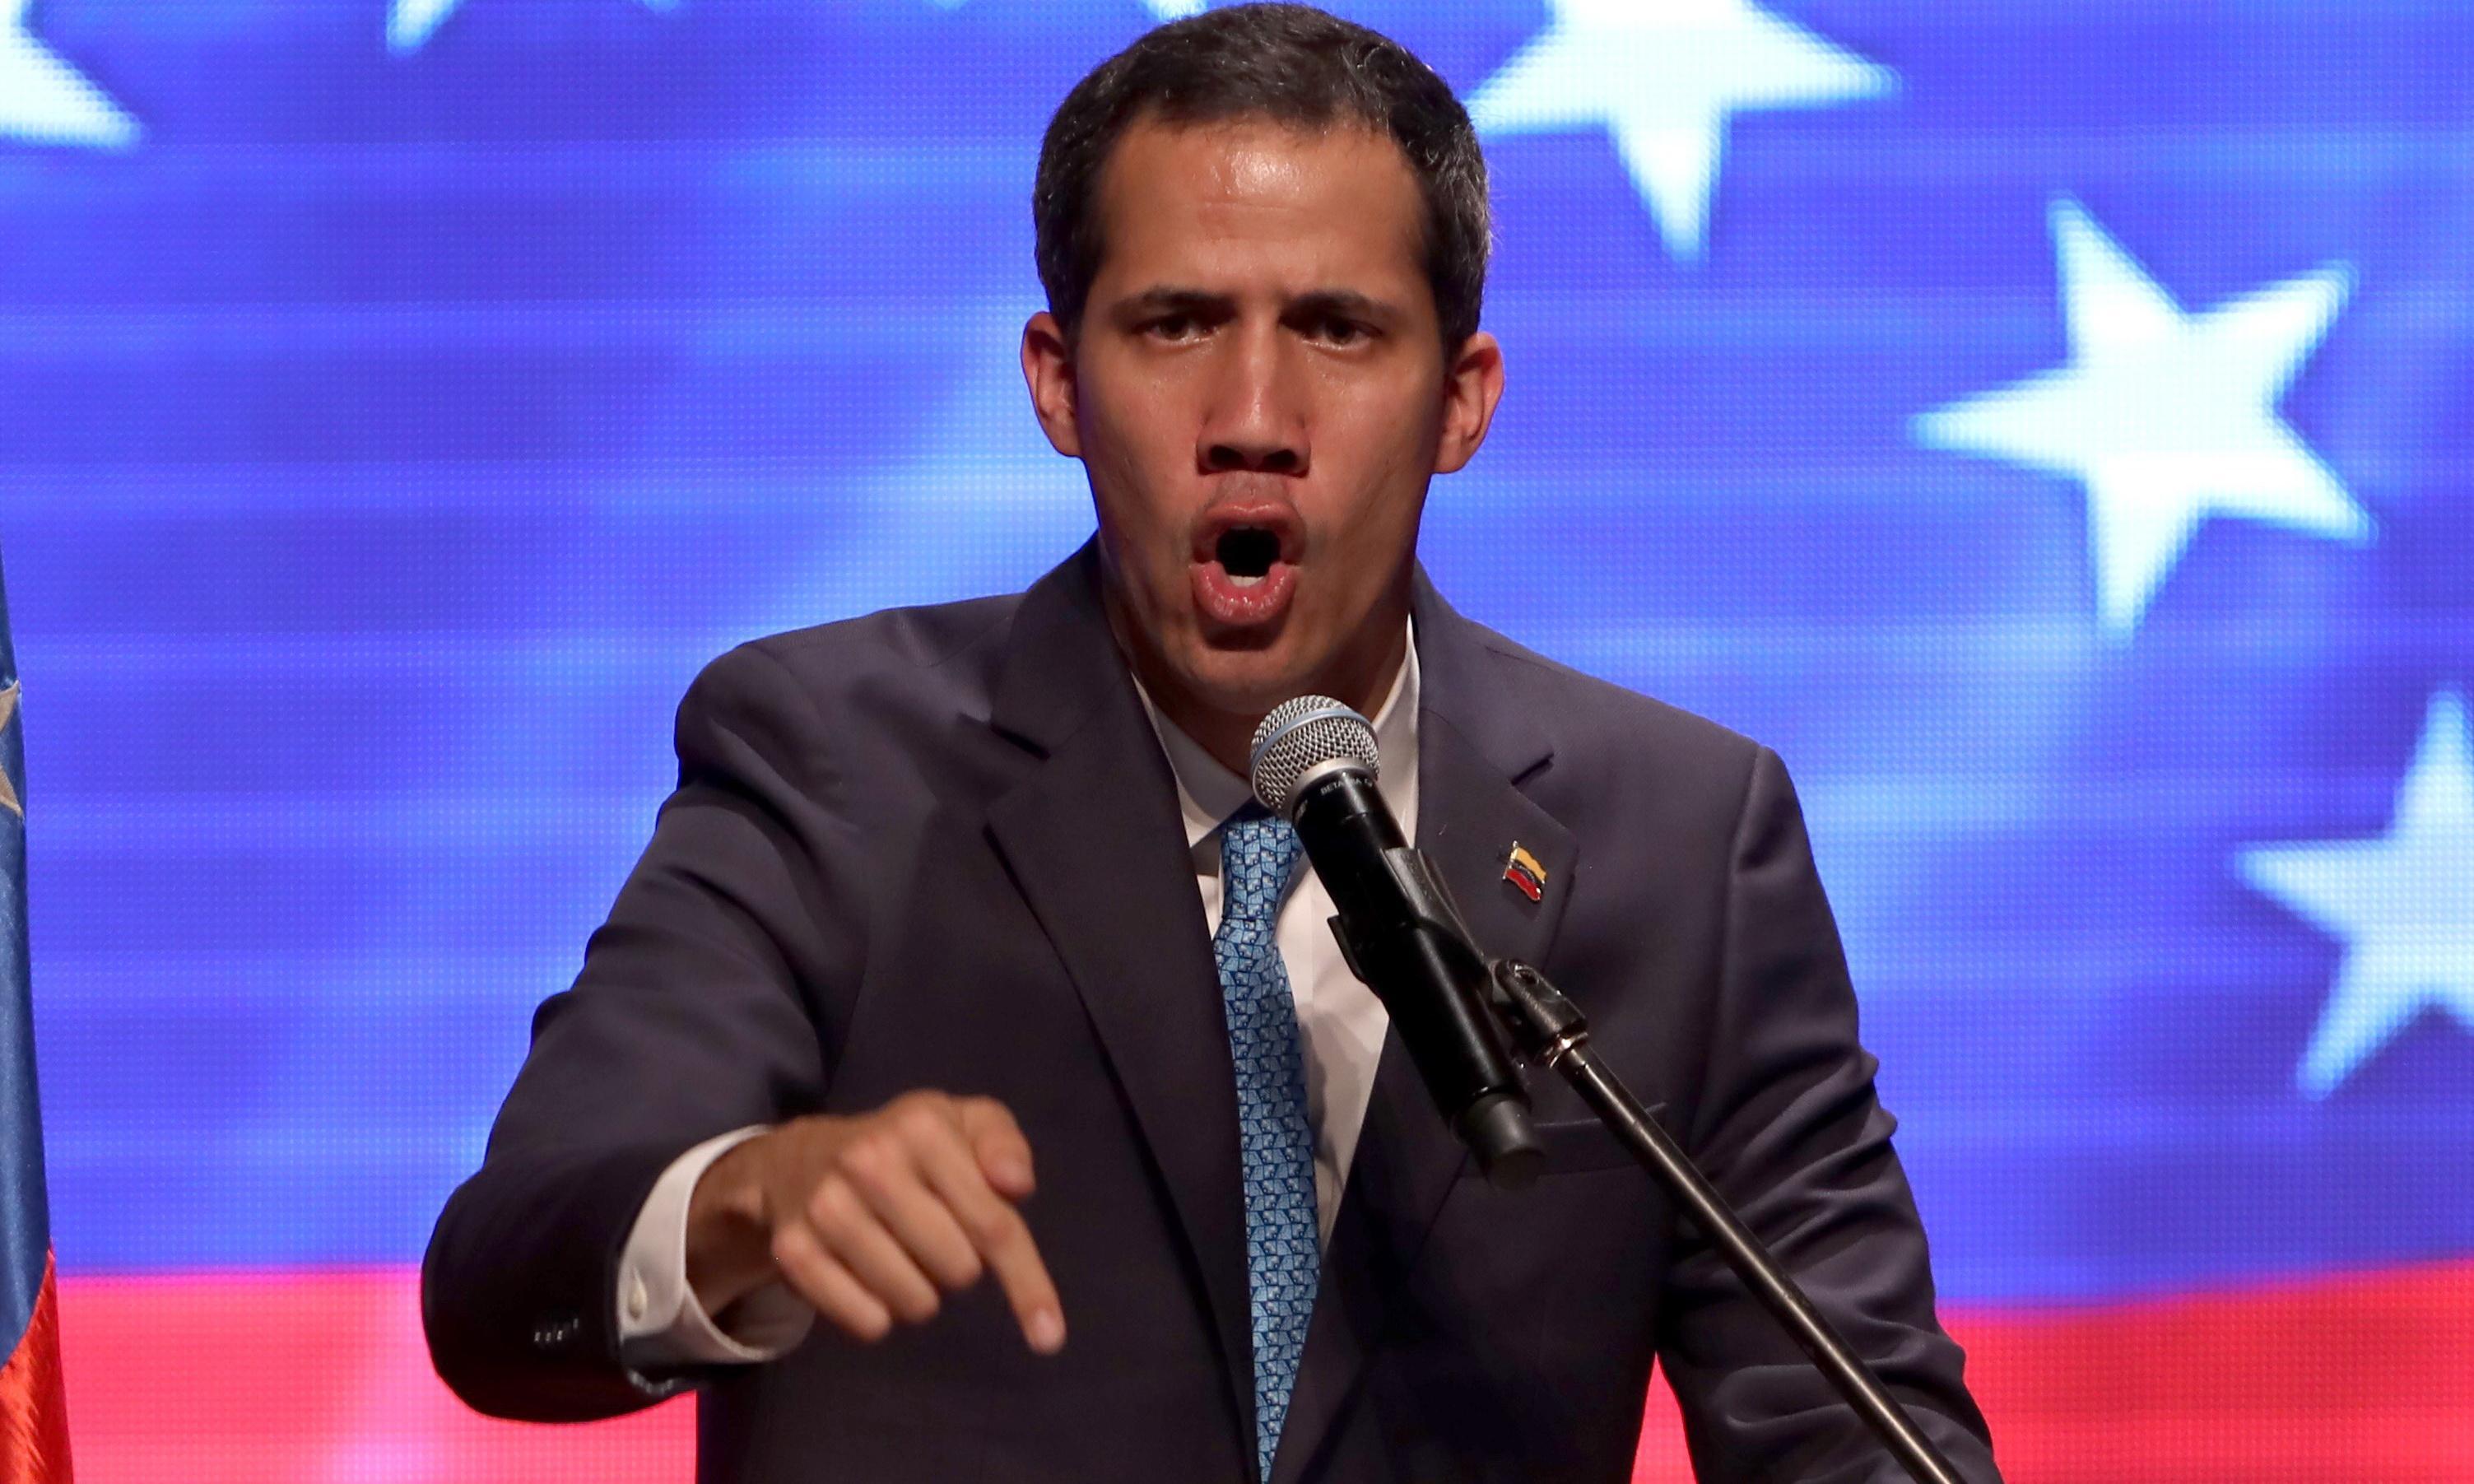 Venezuela: Juan Guaidó denies bid to unseat Maduro has failed